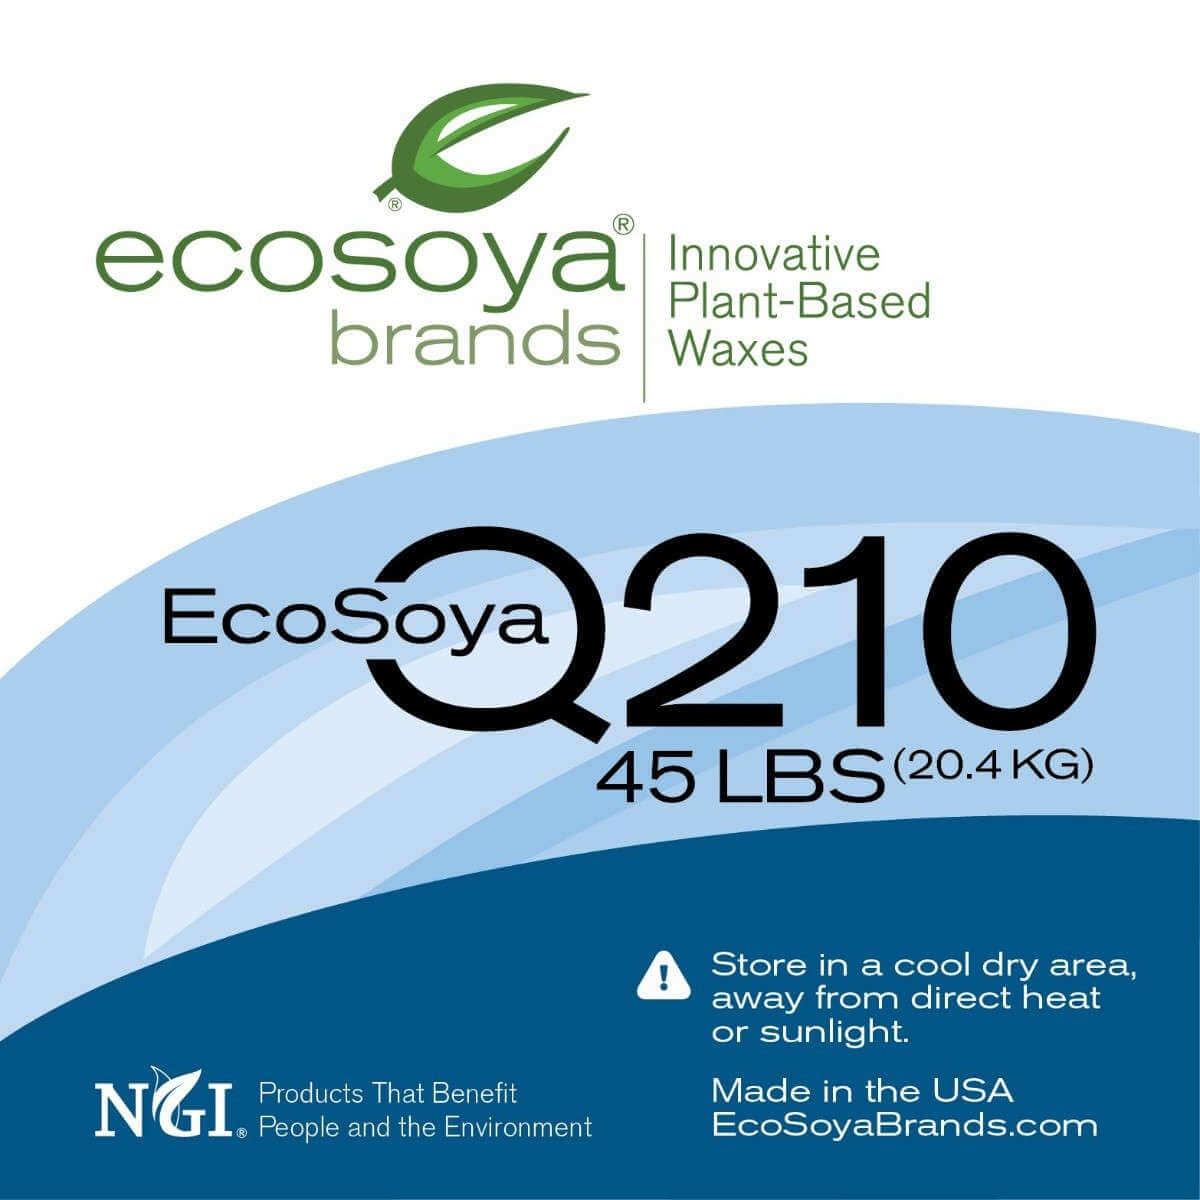 new ecosoya quantum technology waxes